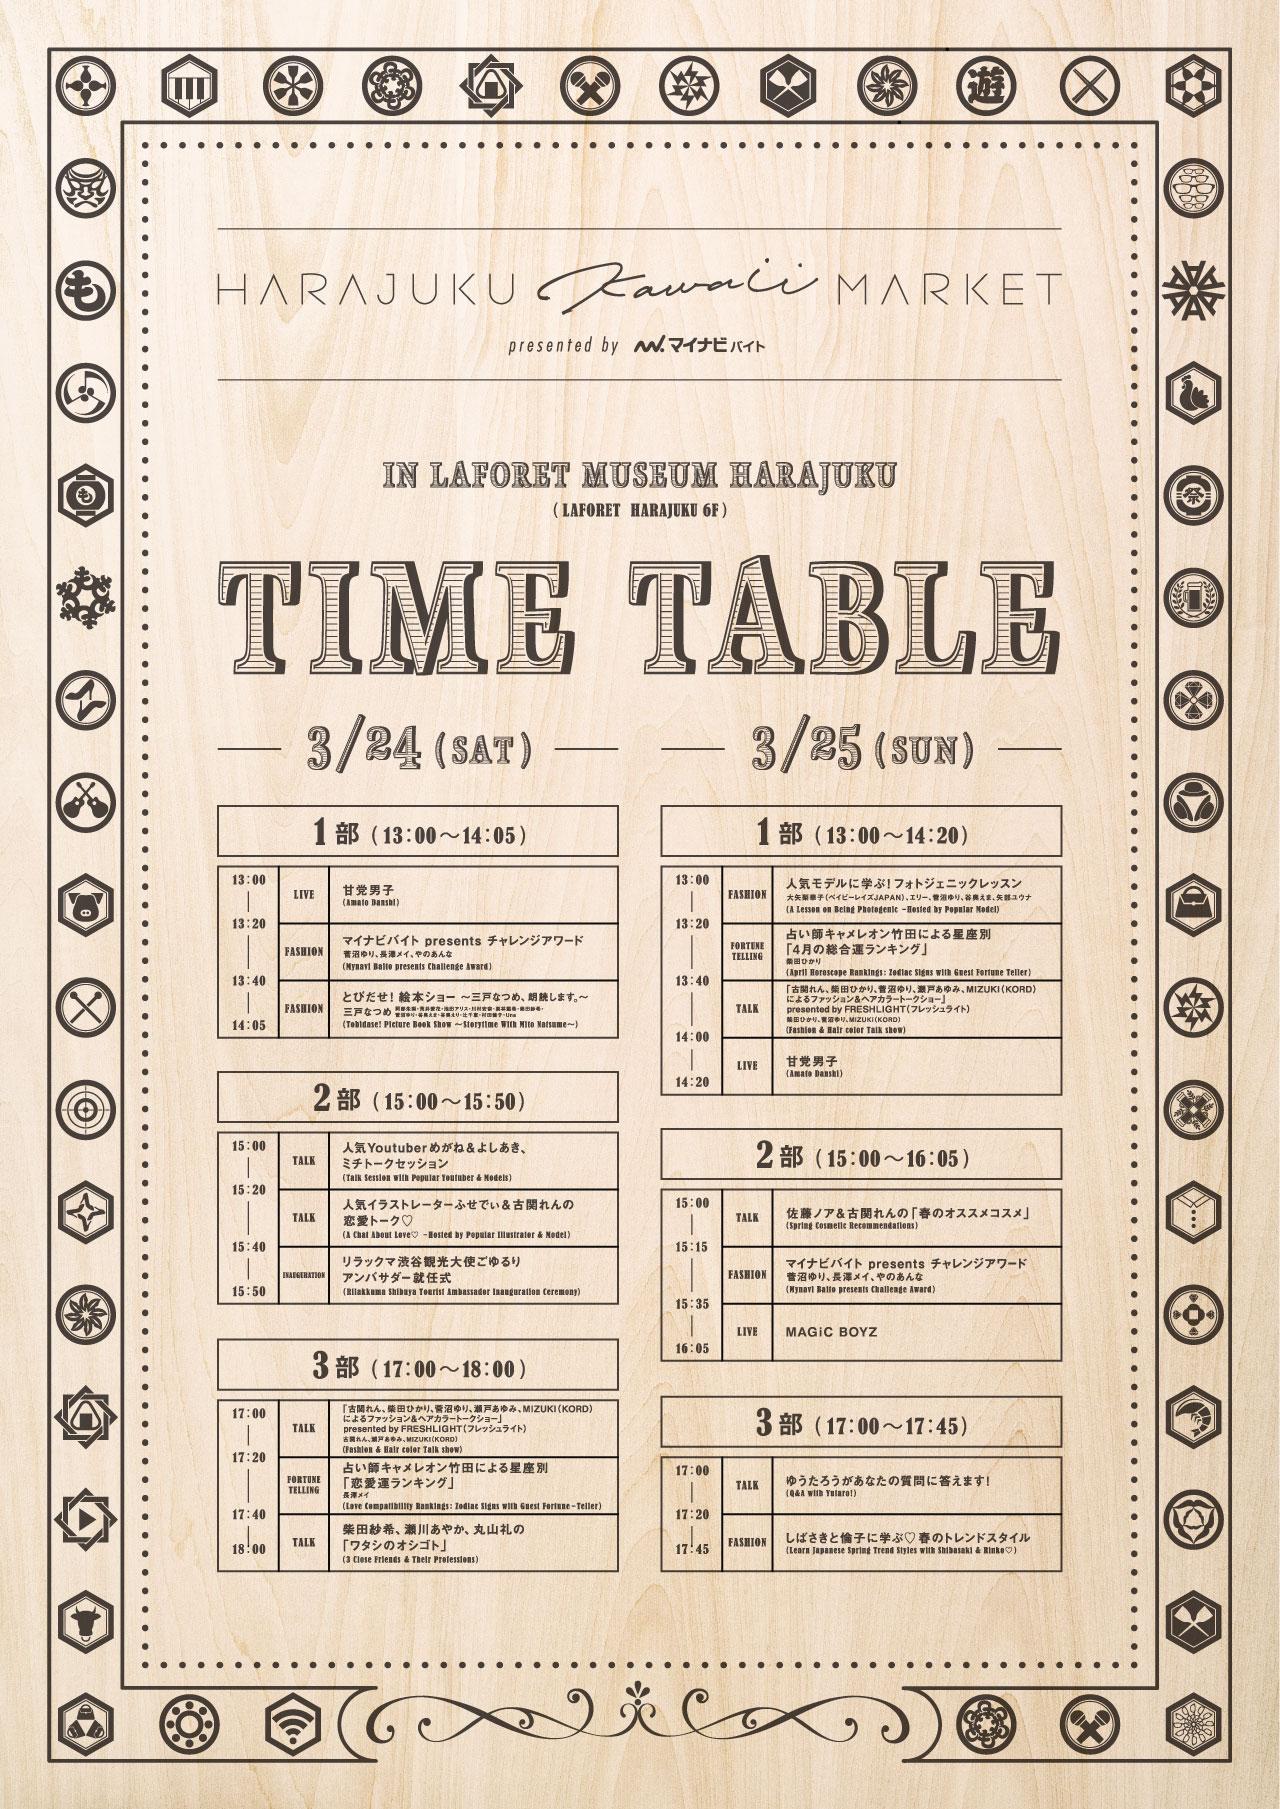 HARAJUKU KAWAII MARKET タイムテーブル